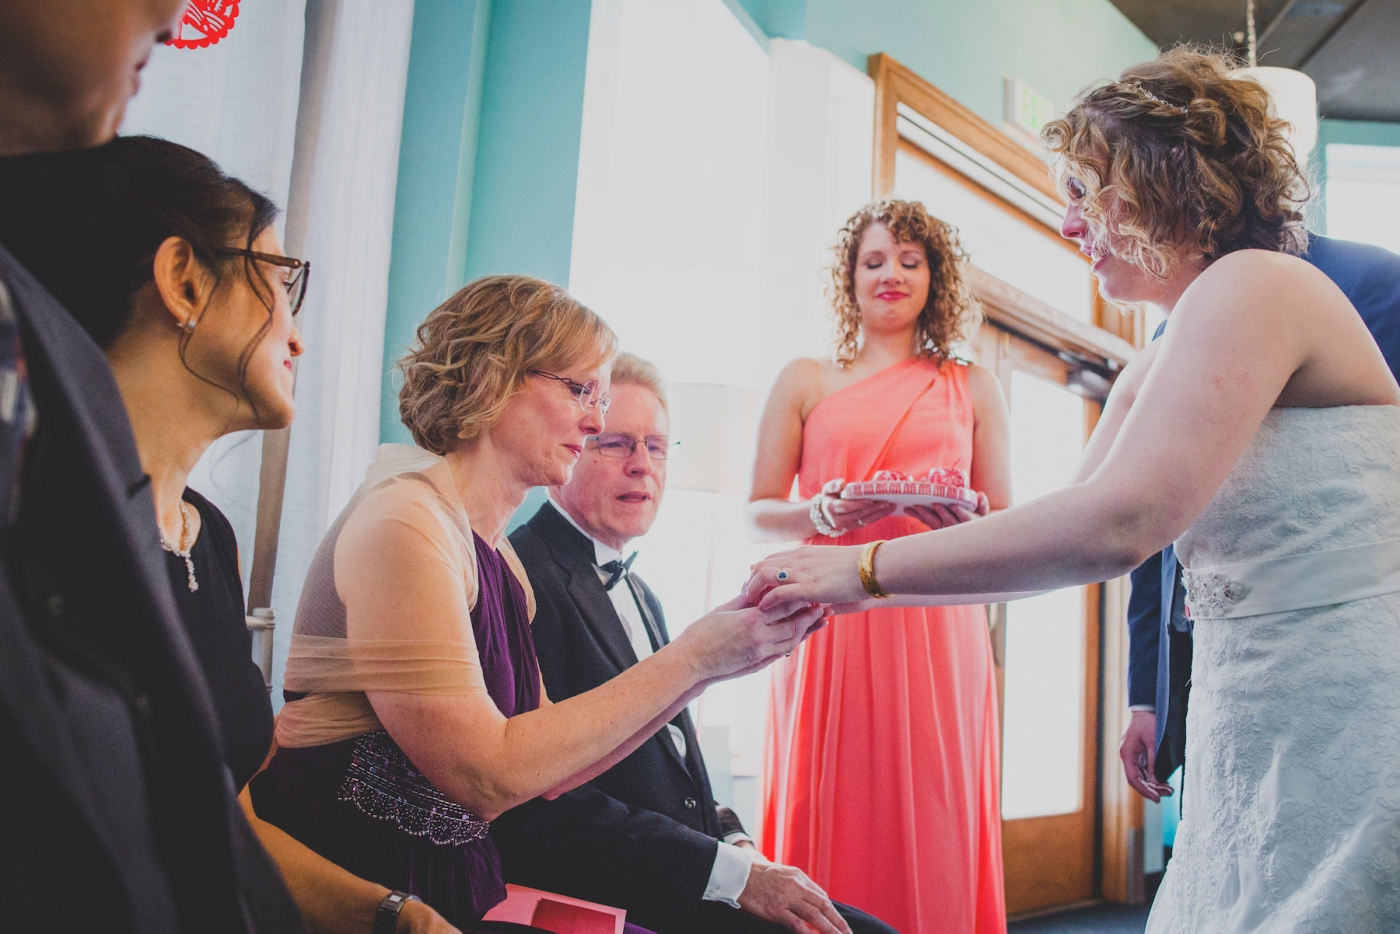 DSC_2990Everett_Wedding_Ballroom_Jane_Speleers_photography_Rachel_and_Edmund_teaceremony_2017